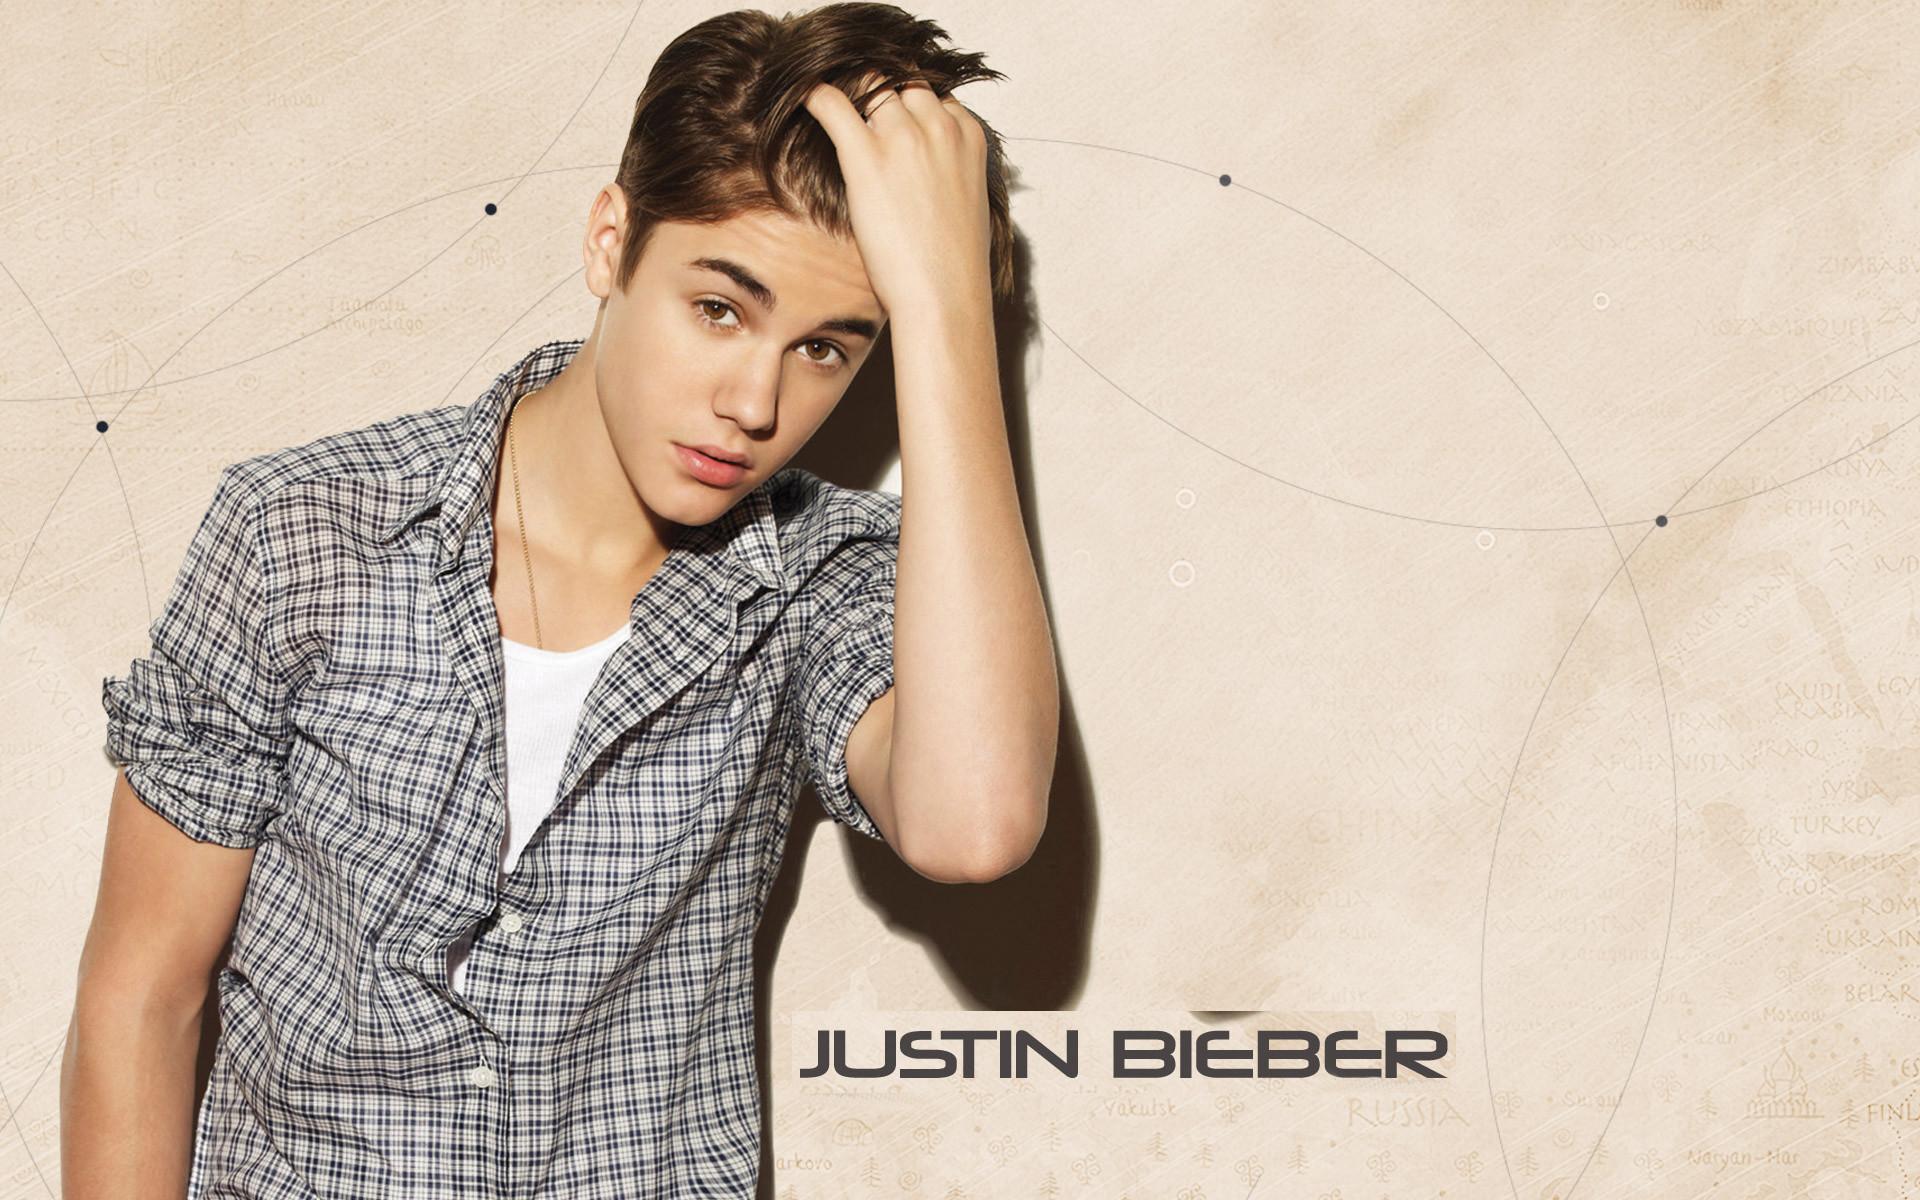 Justin Bieber HD Wallpapers 2013